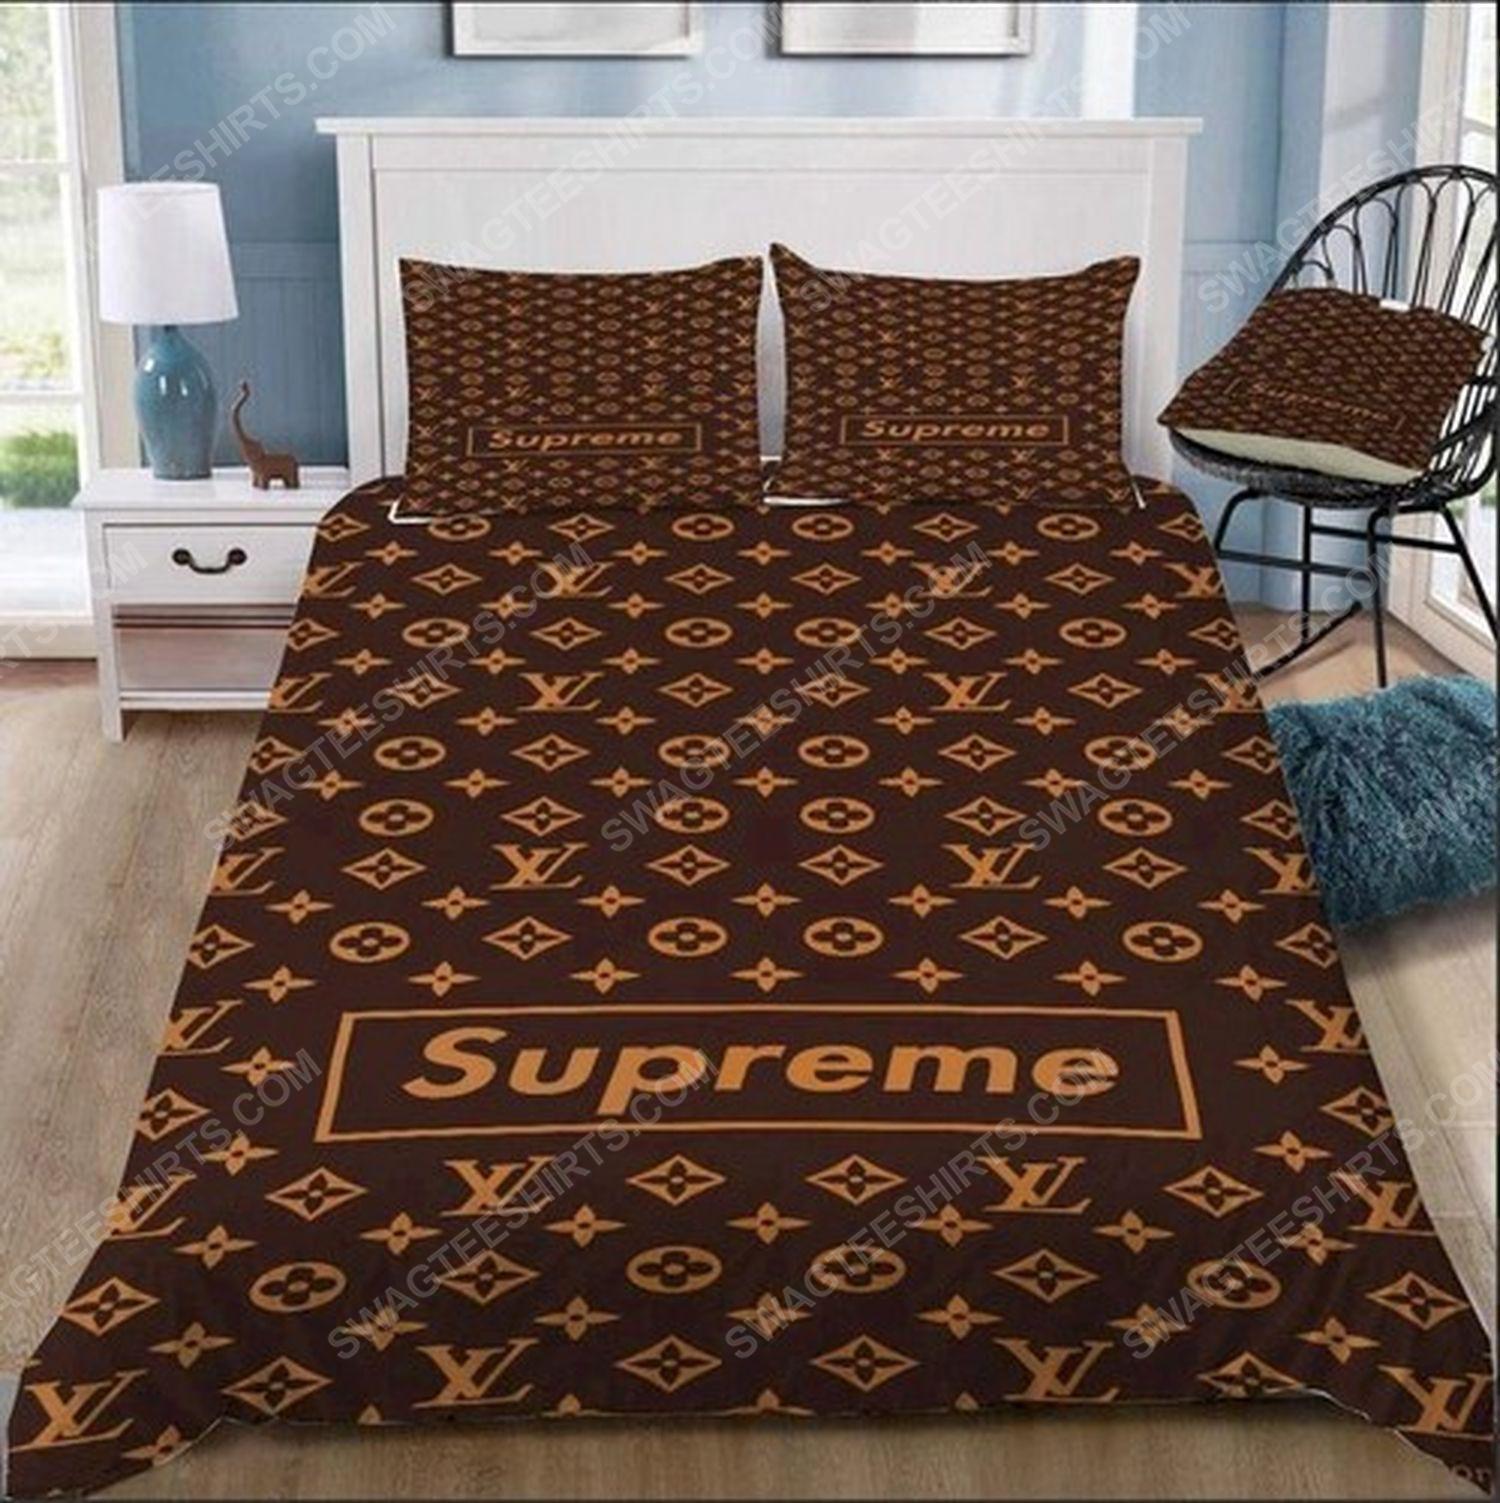 Lv monogram symbols full print duvet cover bedding set 3 - Copy